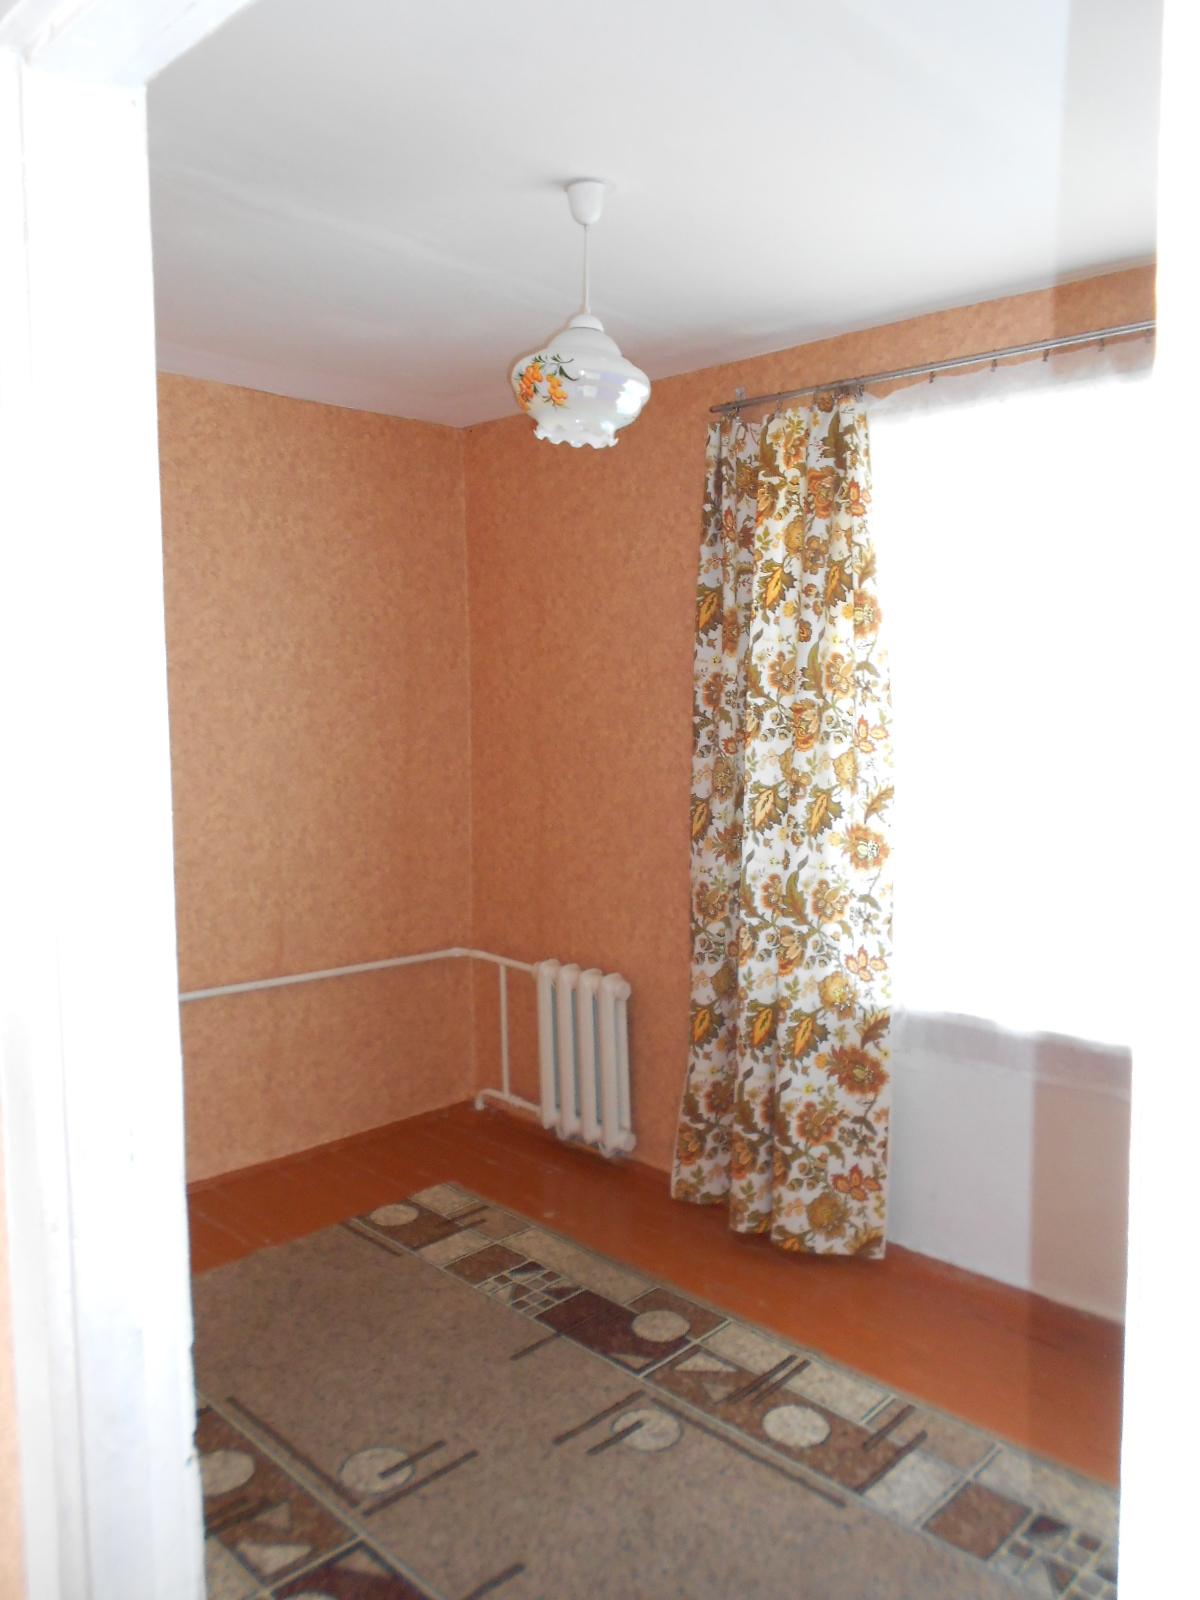 Продается 3-х комнатная квартира по ул. Гогиберидзе